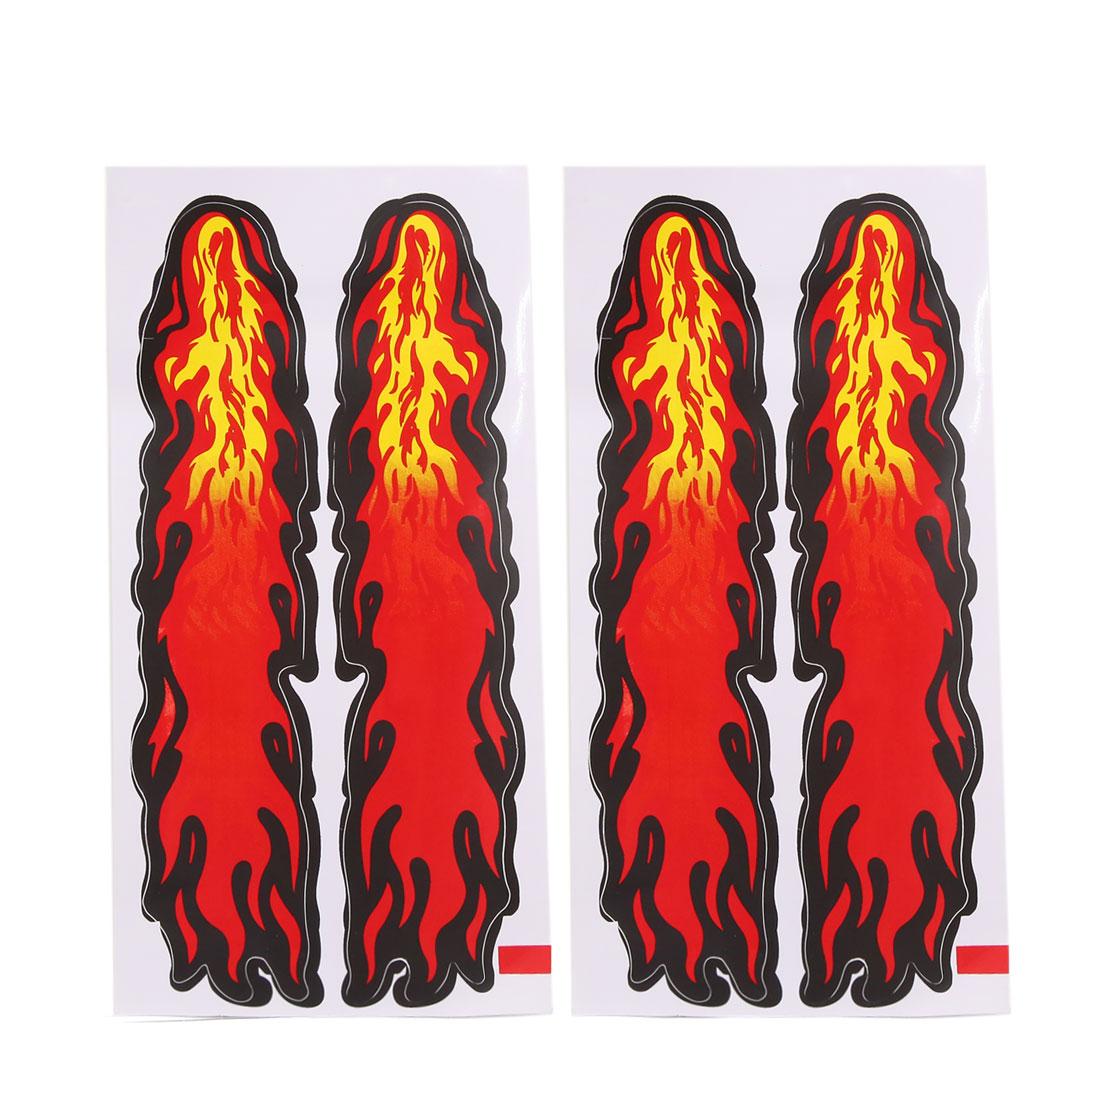 4 Pcs Flame Pattern Self Adhesive Auto Car Decorative Stickers Exterior Decors